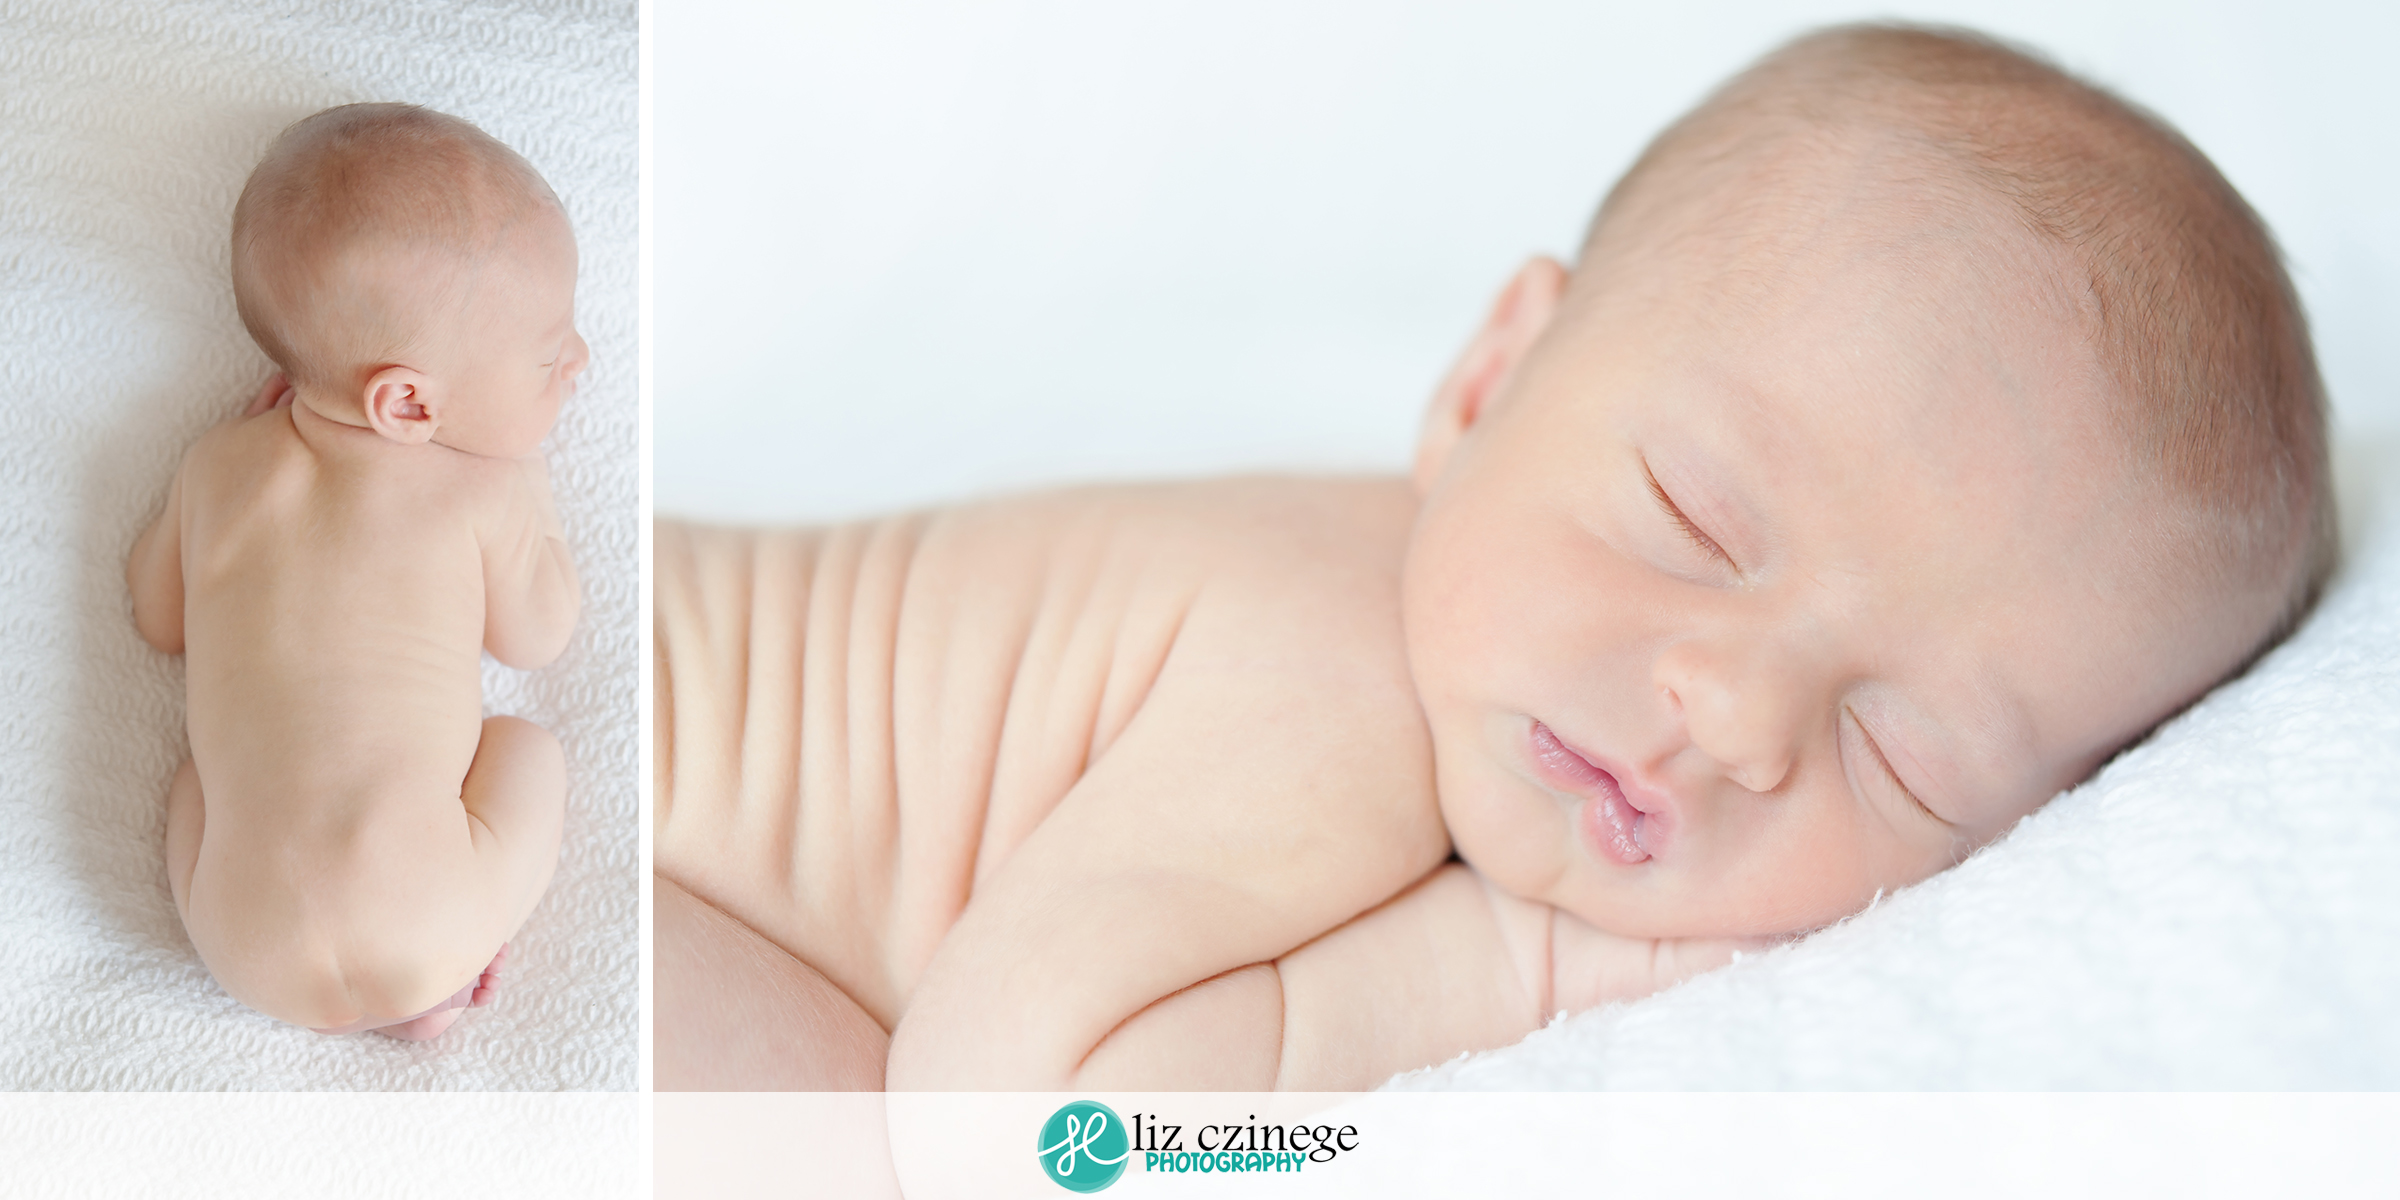 czinege-photography-niagara-newborn-05